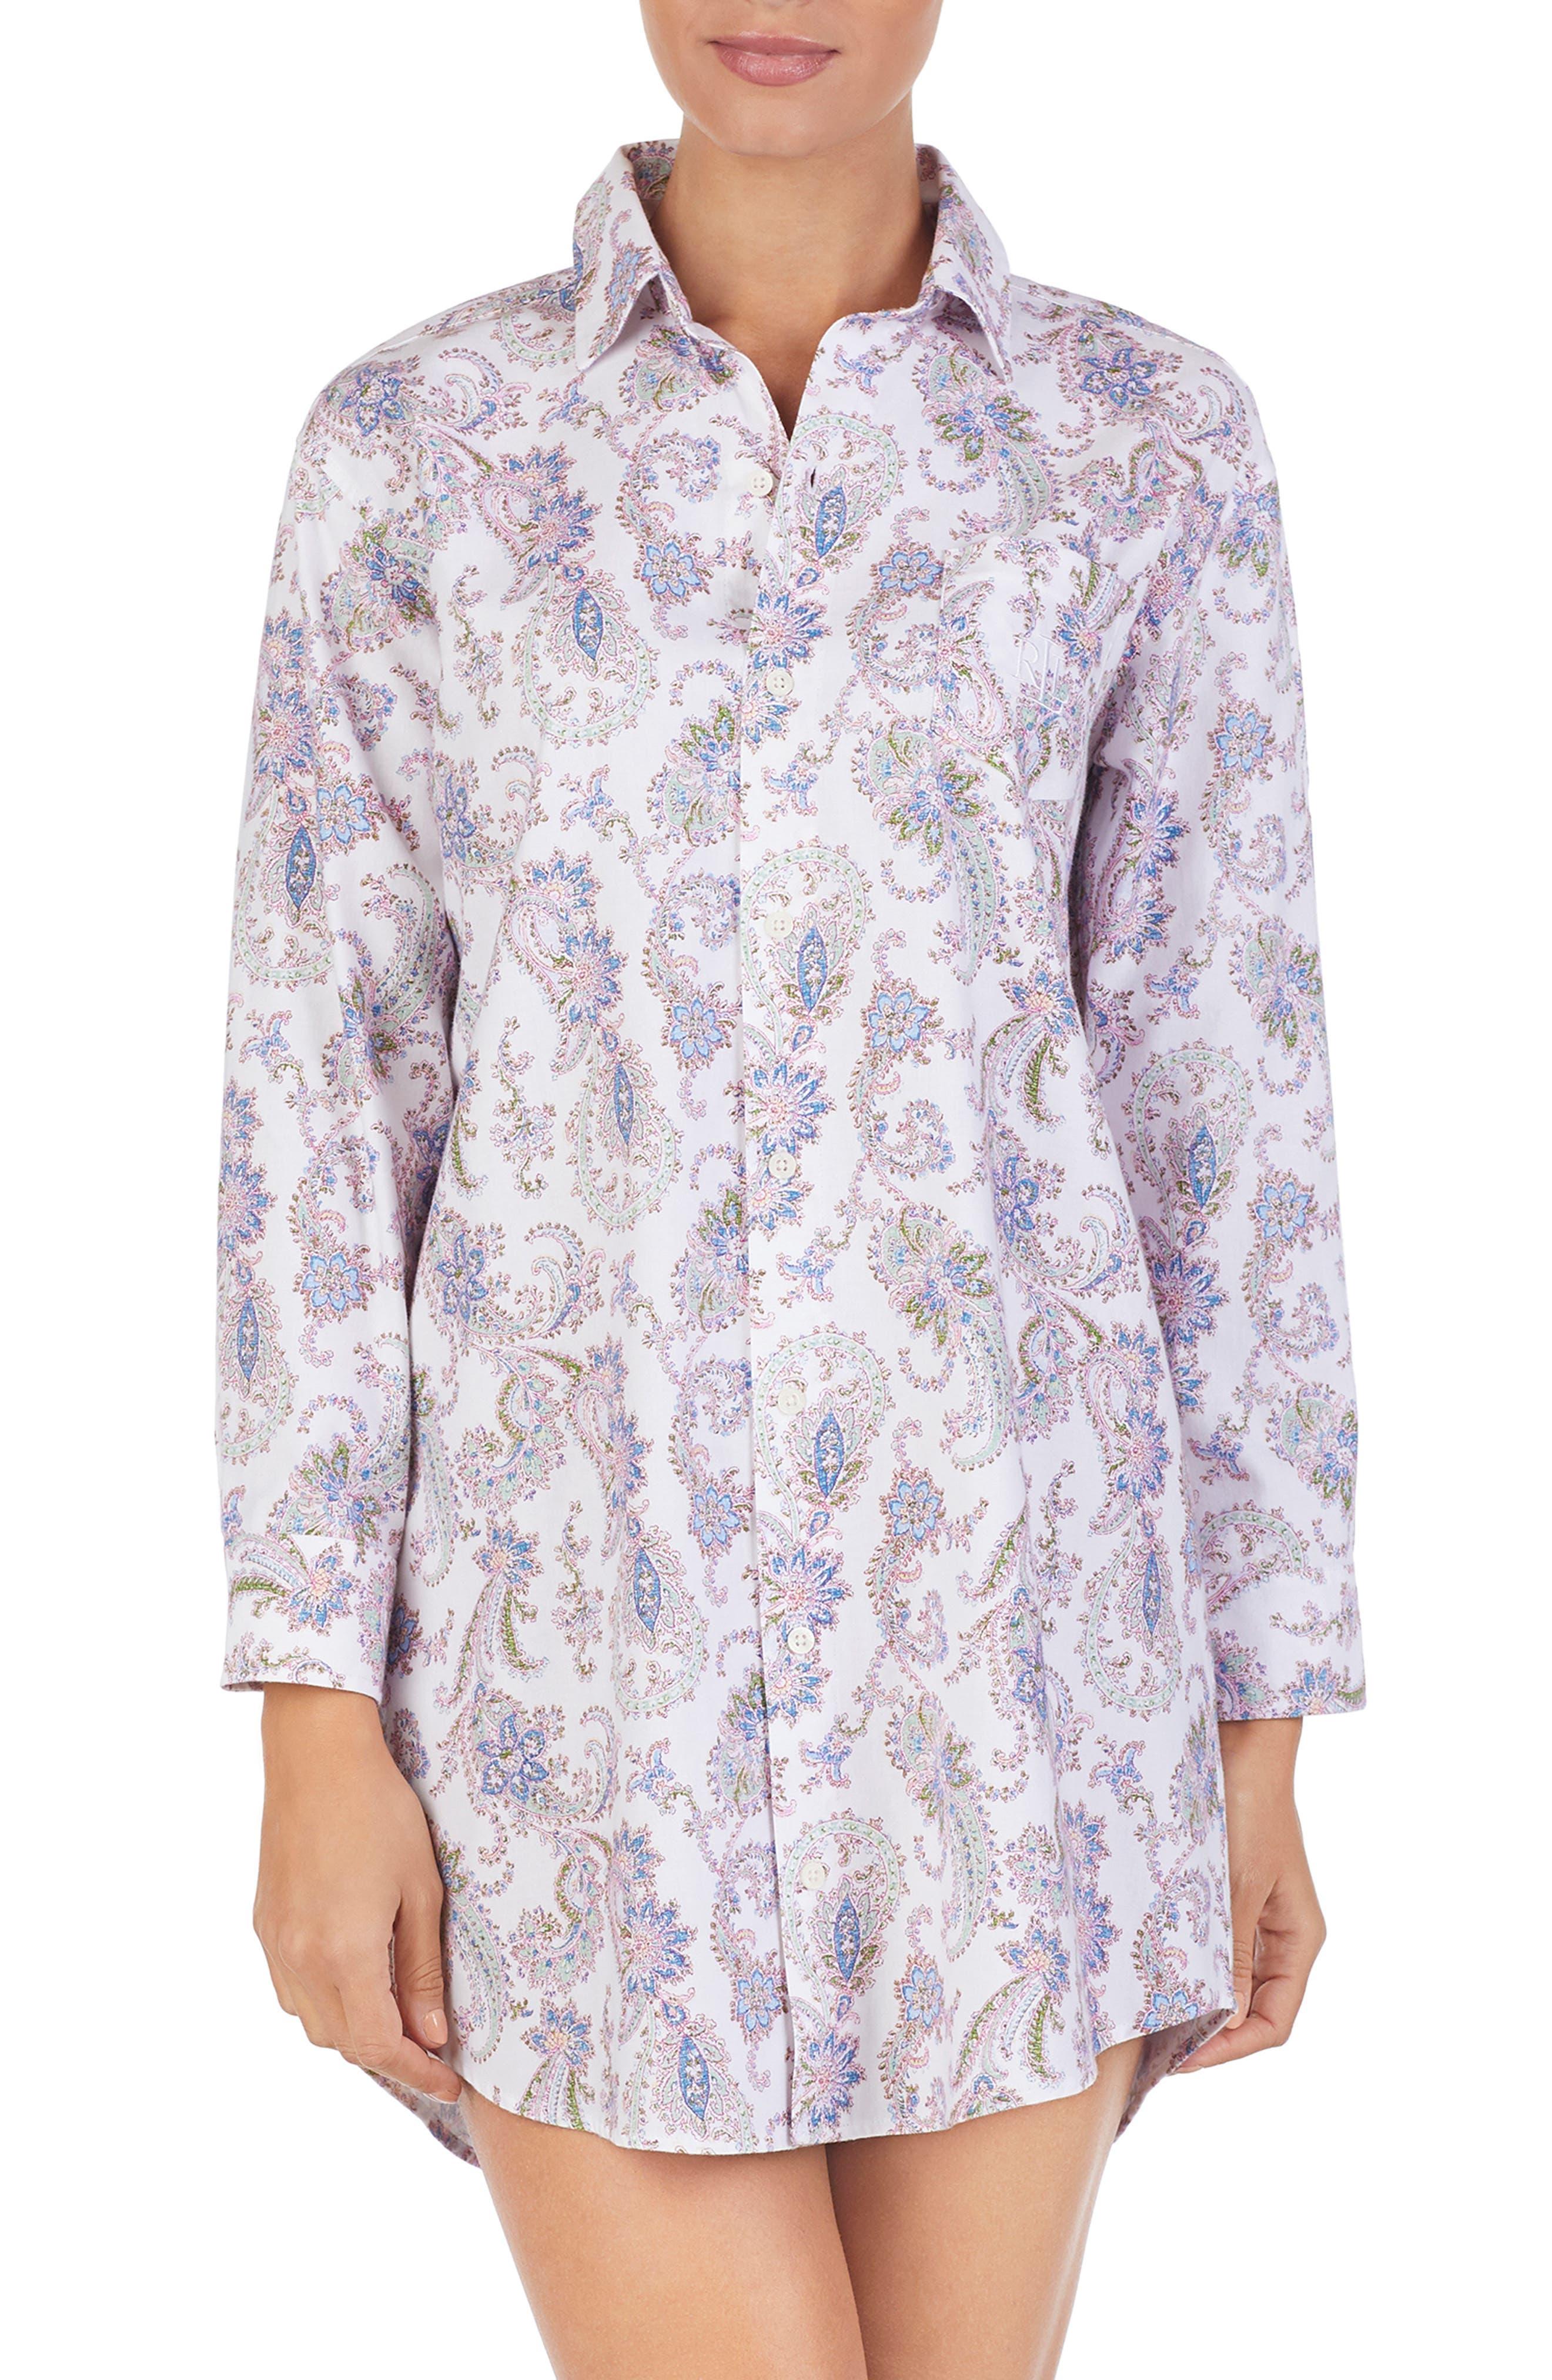 Lauren Ralph Lauren His Paisley Sleep Shirt, White